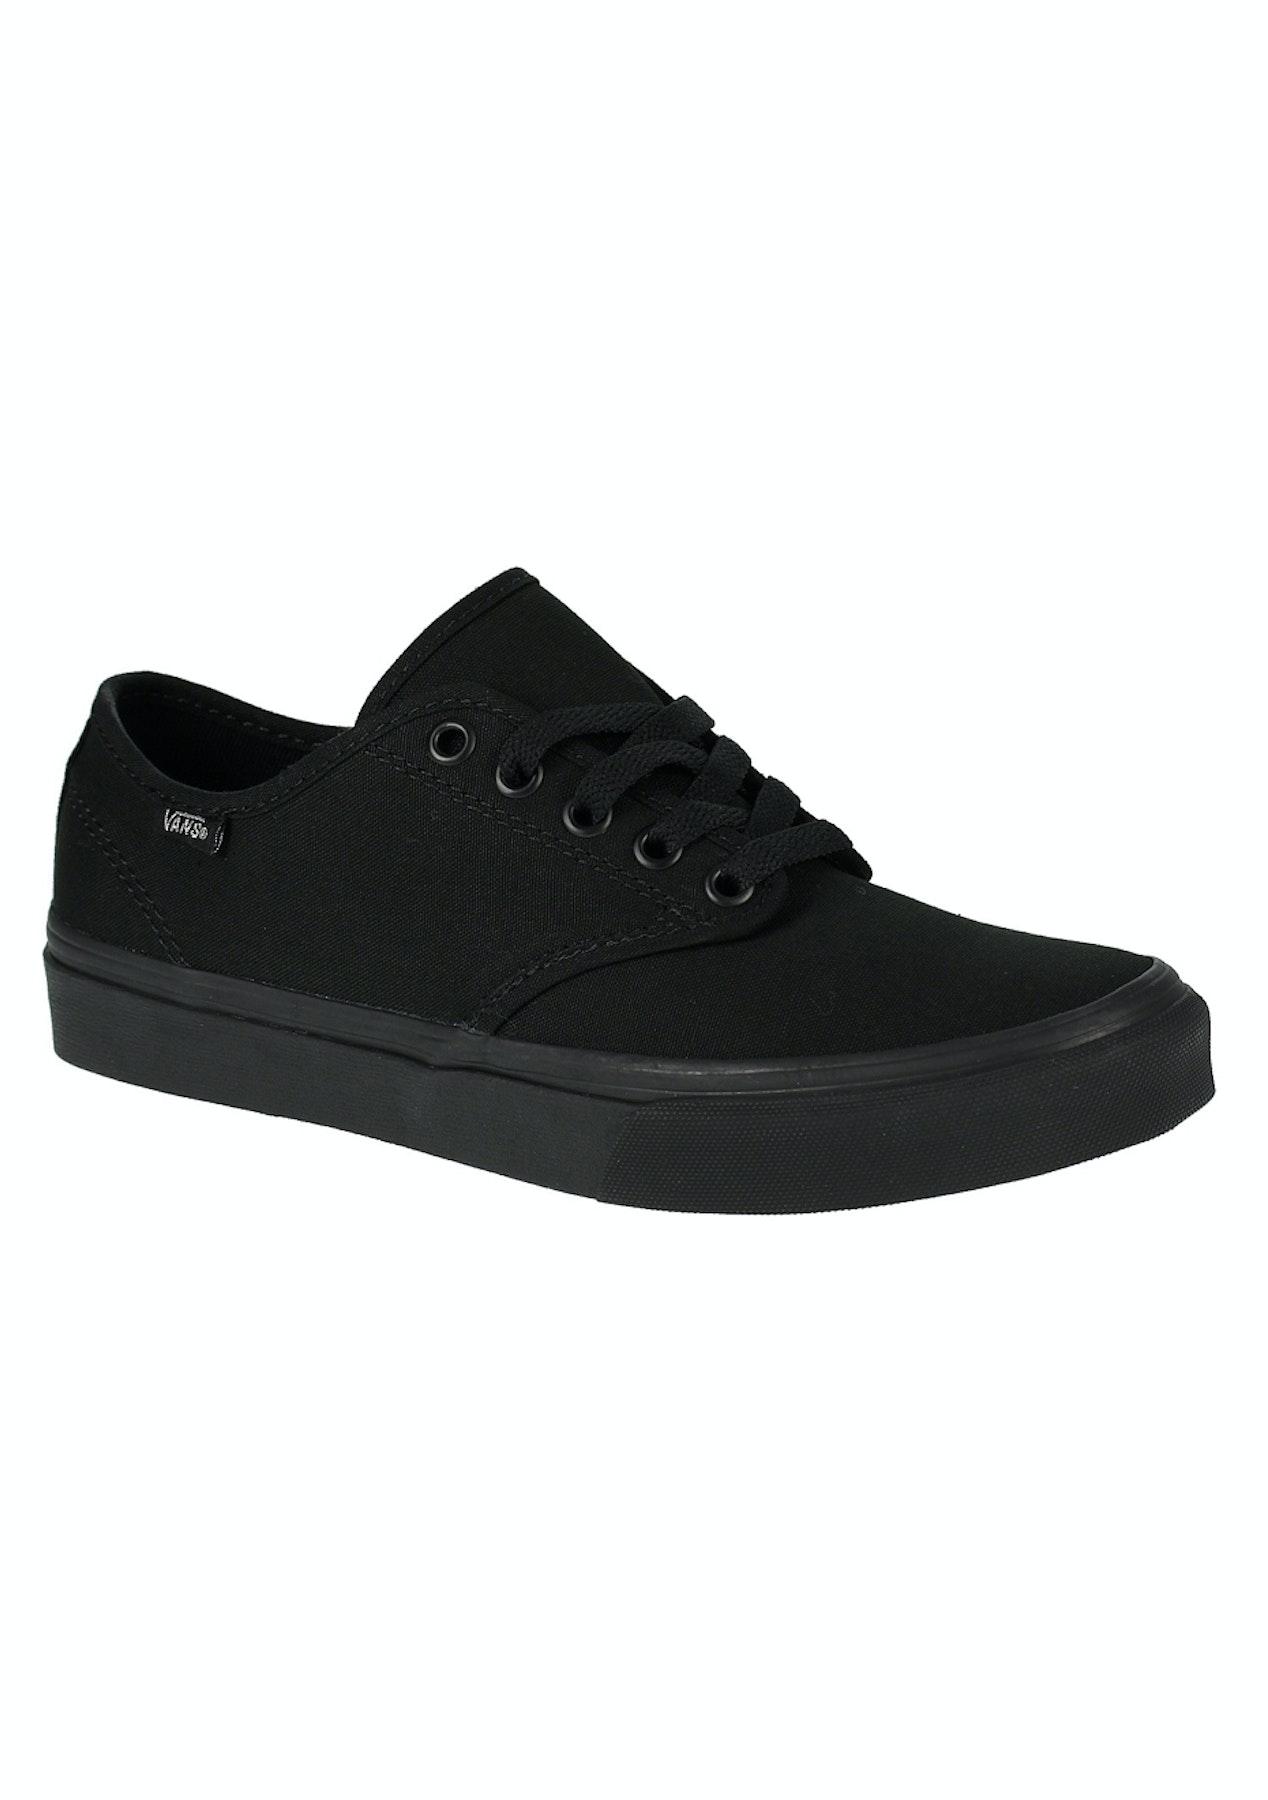 de8bdb50bbfb31 Vans - Womens Camden Stripe - Canvas - Black Black - Free Shipping Street  Shoes + Slides - Onceit